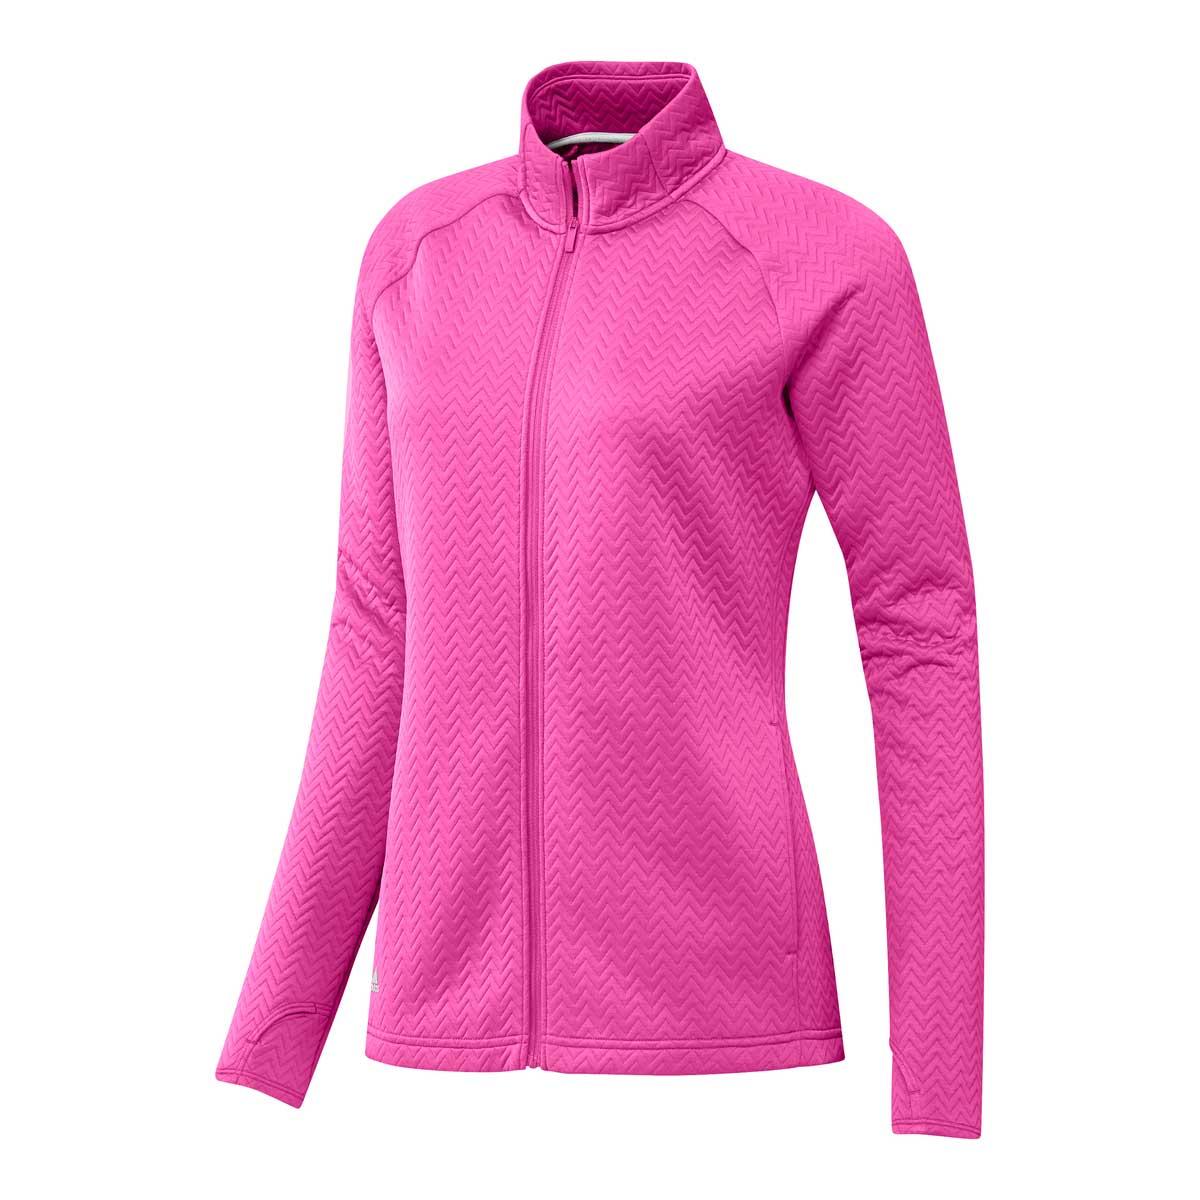 Adidas Women's Textured Full Zip Screaming Pink Jacket